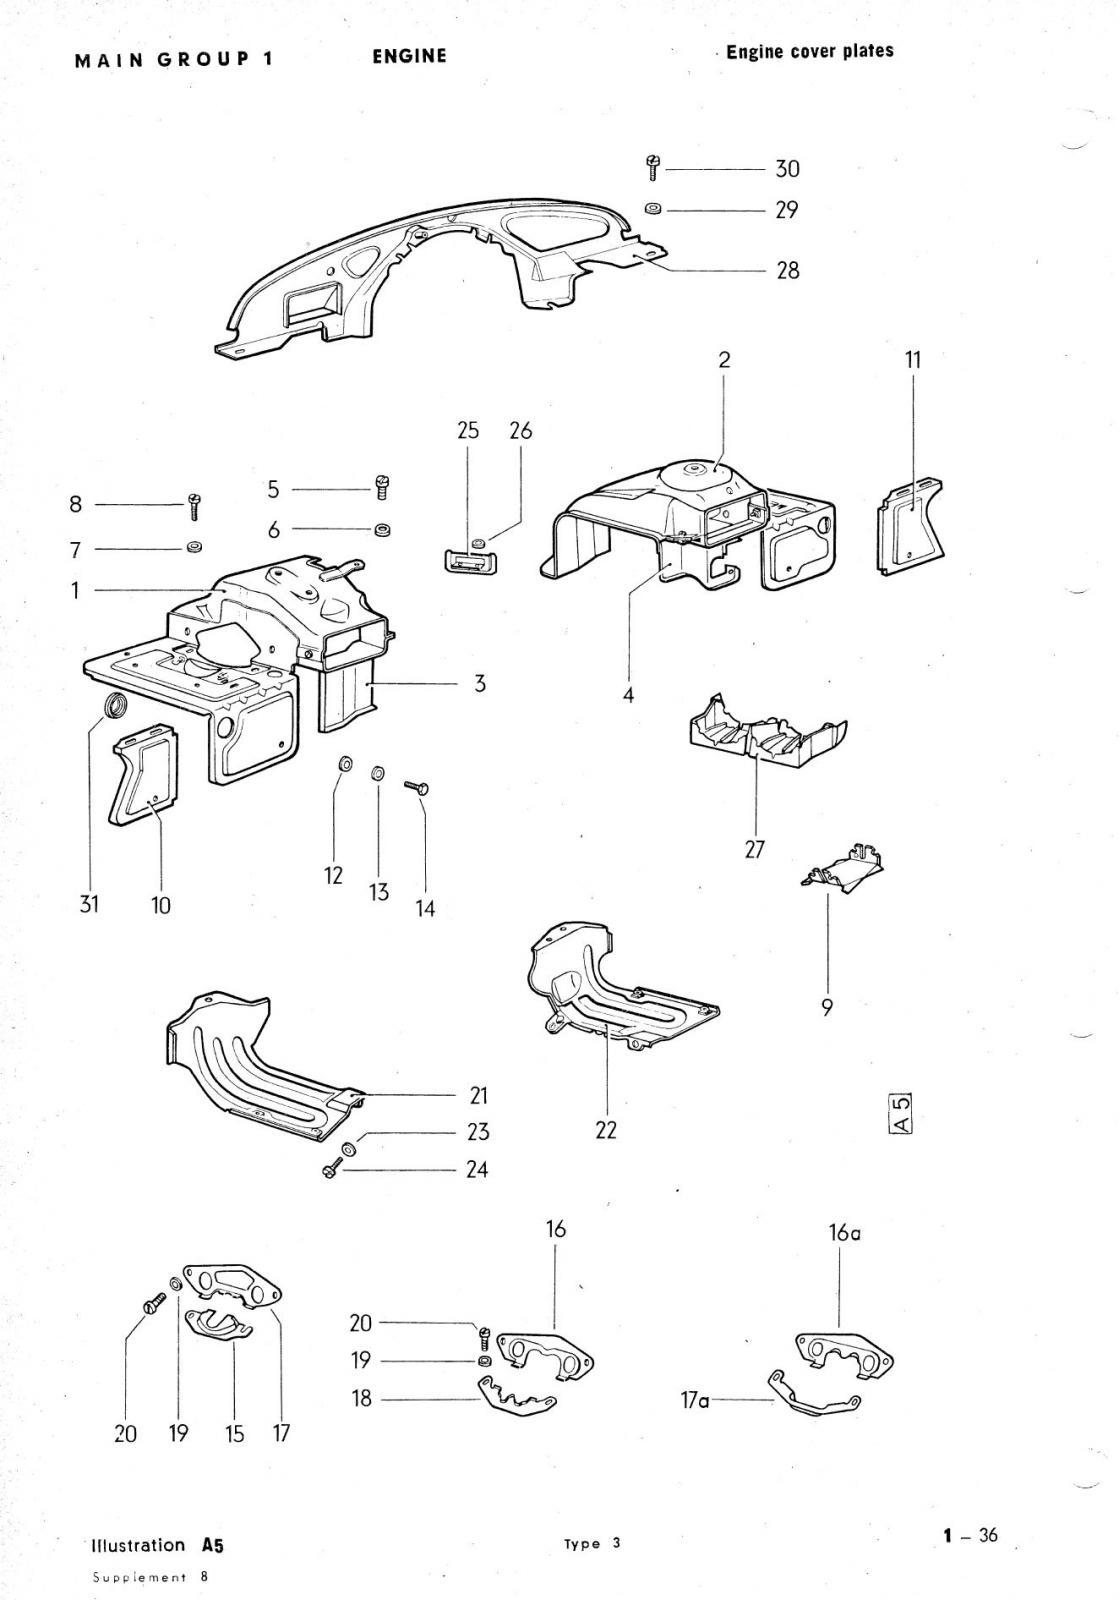 Remarkable Volkswagen Pet Engine Diagram Volkswagen Free Engine Image For User Wiring Cloud Eachirenstrafr09Org